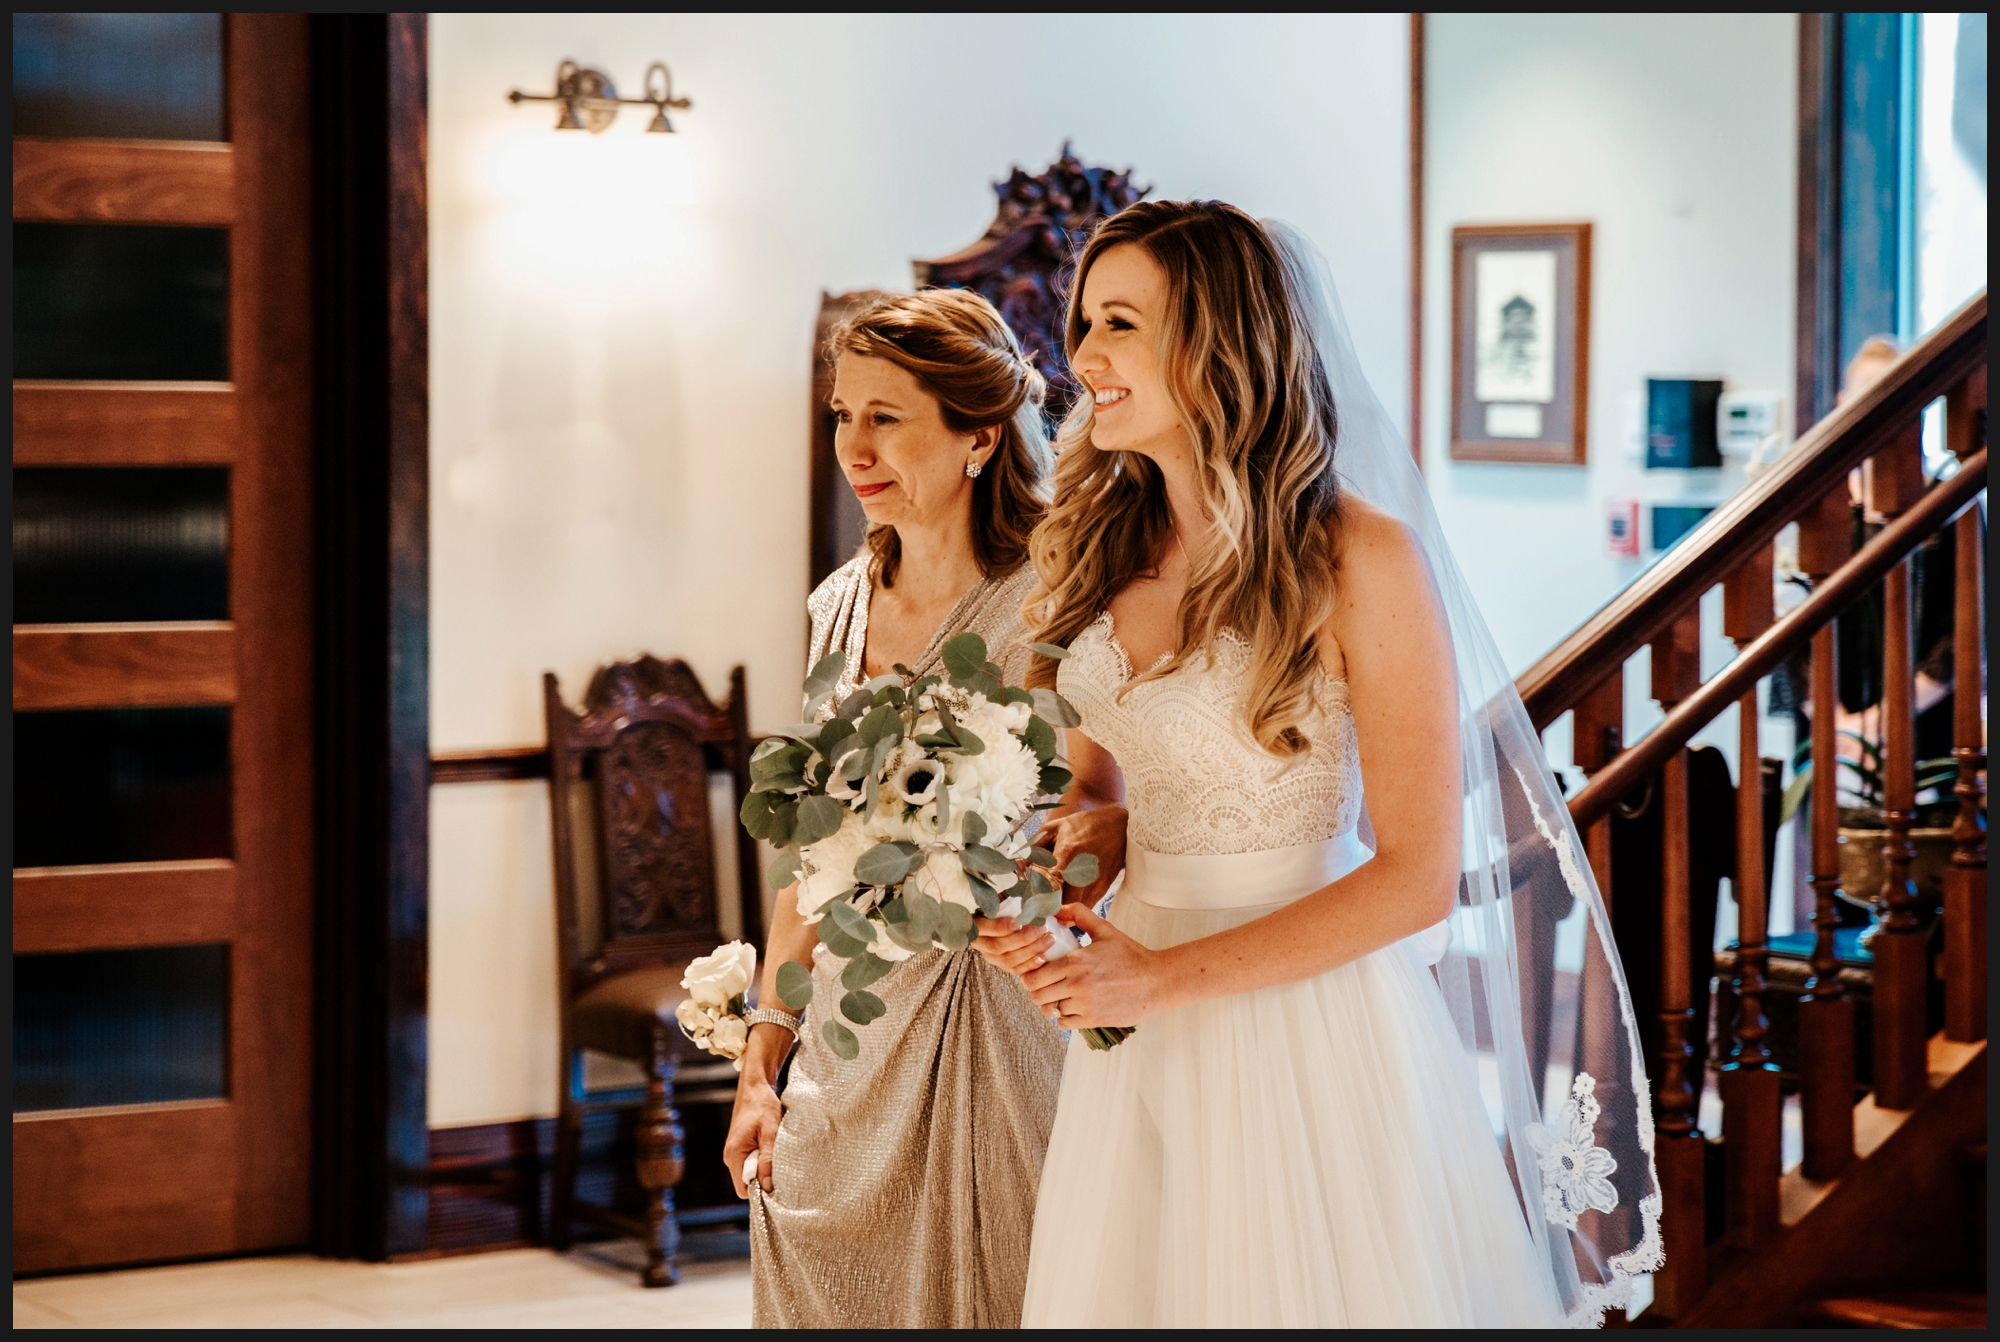 Orlando-Wedding-Photographer-destination-wedding-photographer-florida-wedding-photographer-bohemian-wedding-photographer_0272.jpg